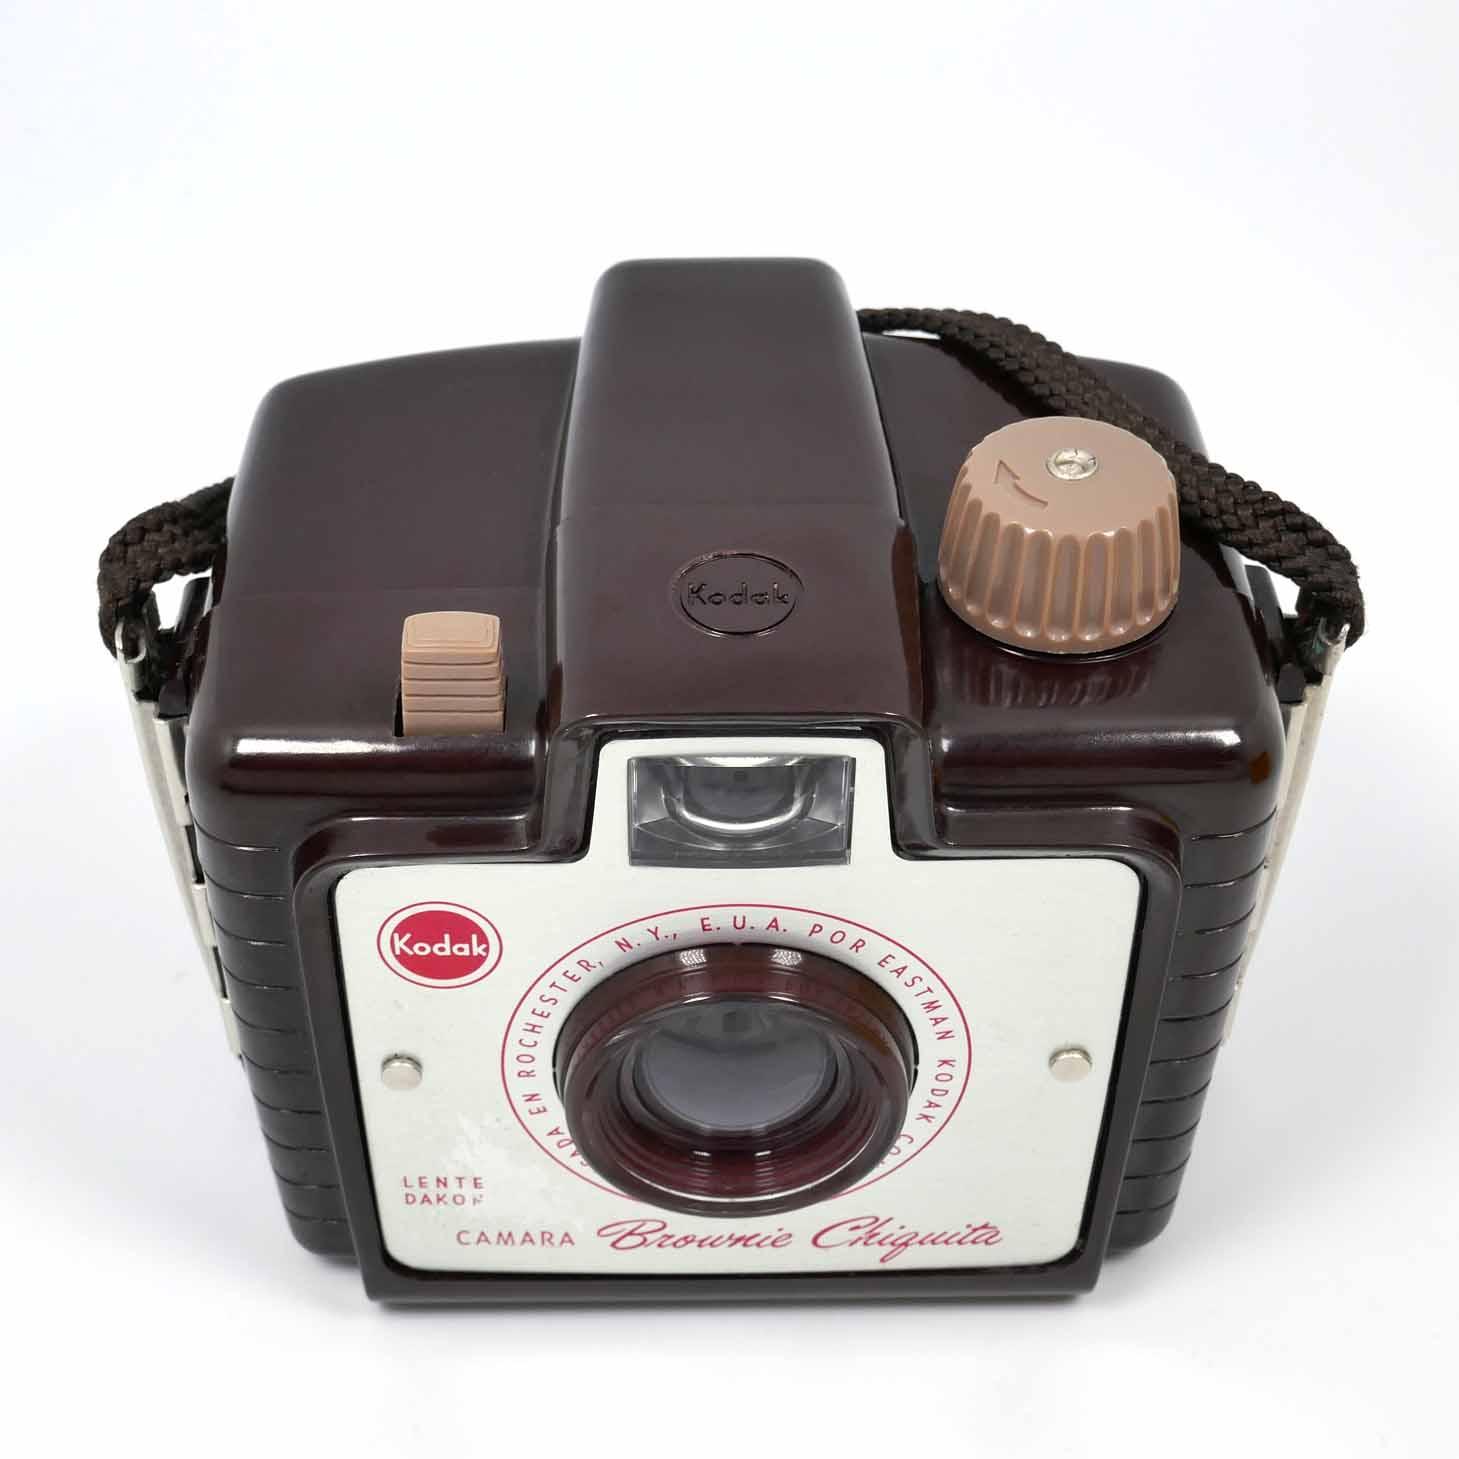 clean-cameras-Kodak-Box-Brownie-Chiquita-05